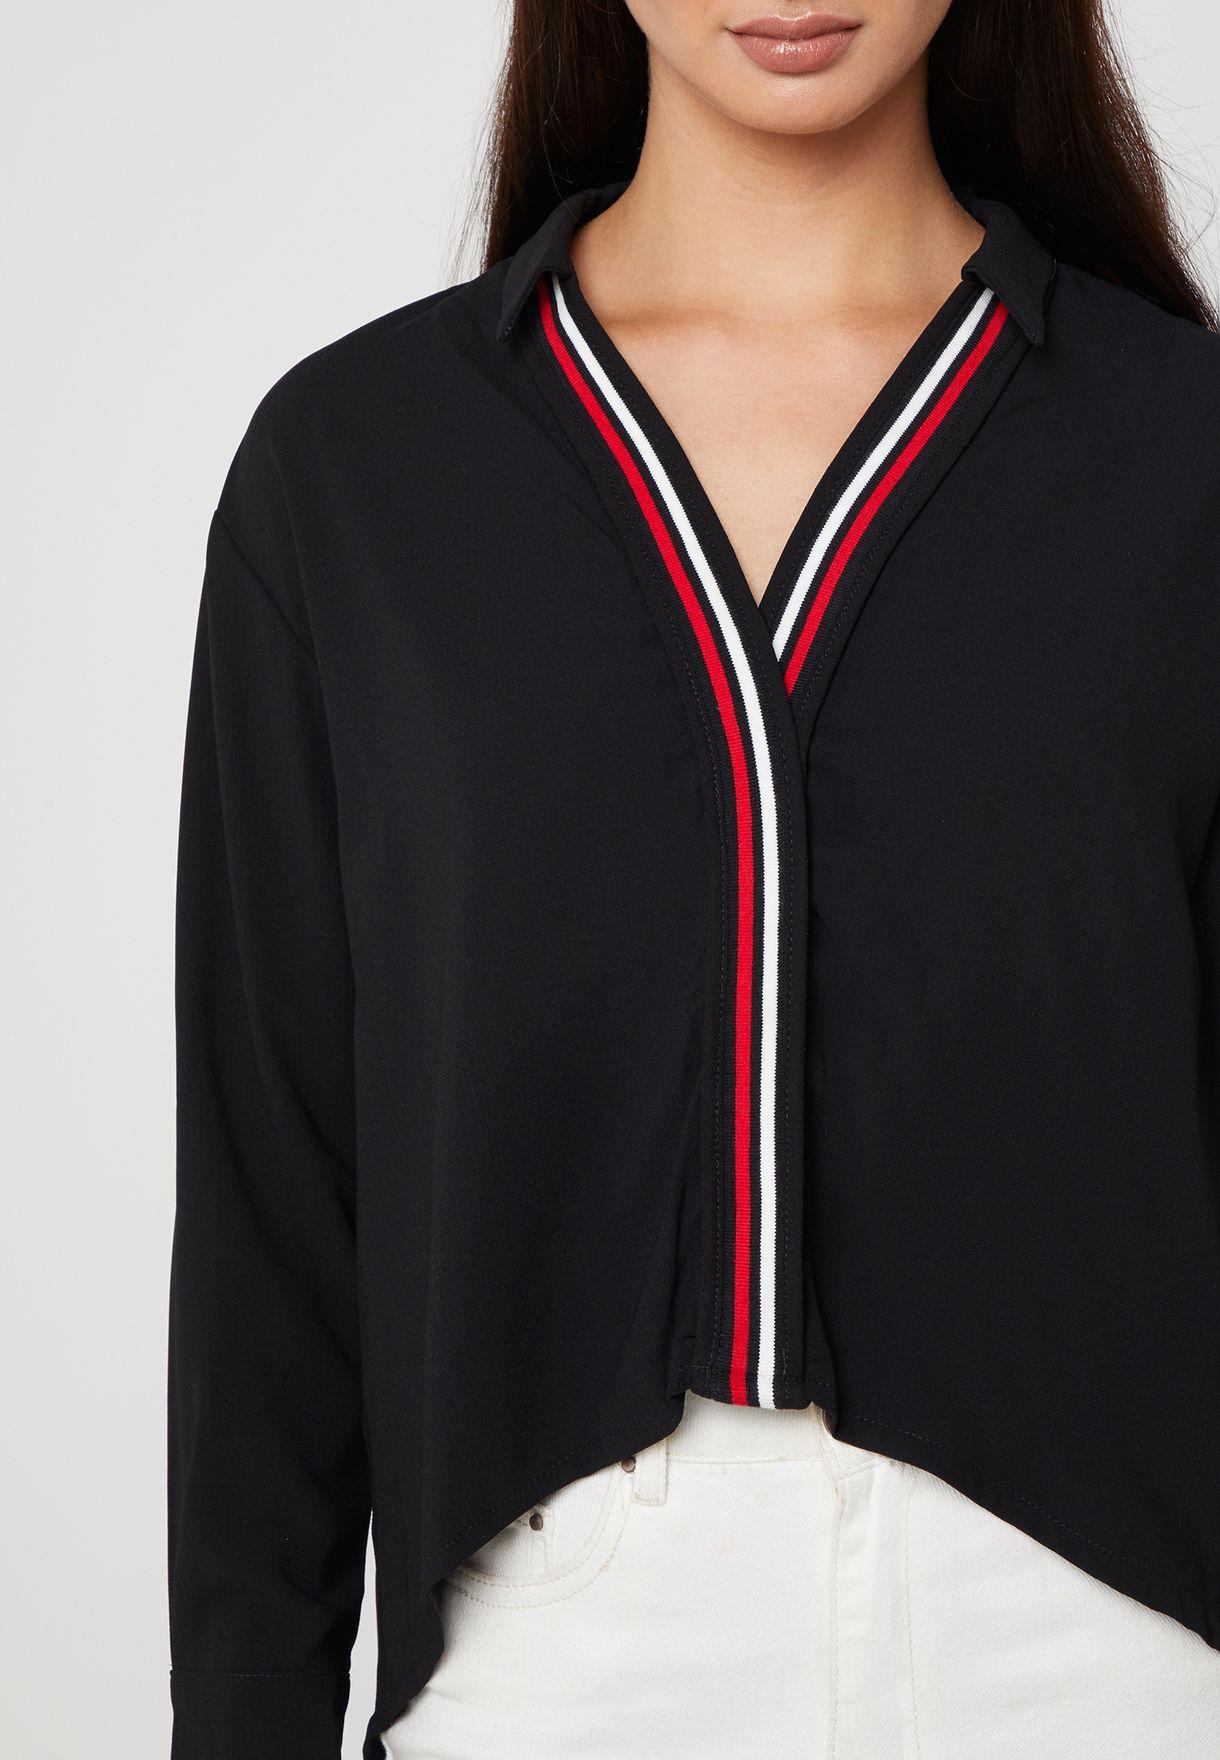 قميص مع حواف بلون مغاير